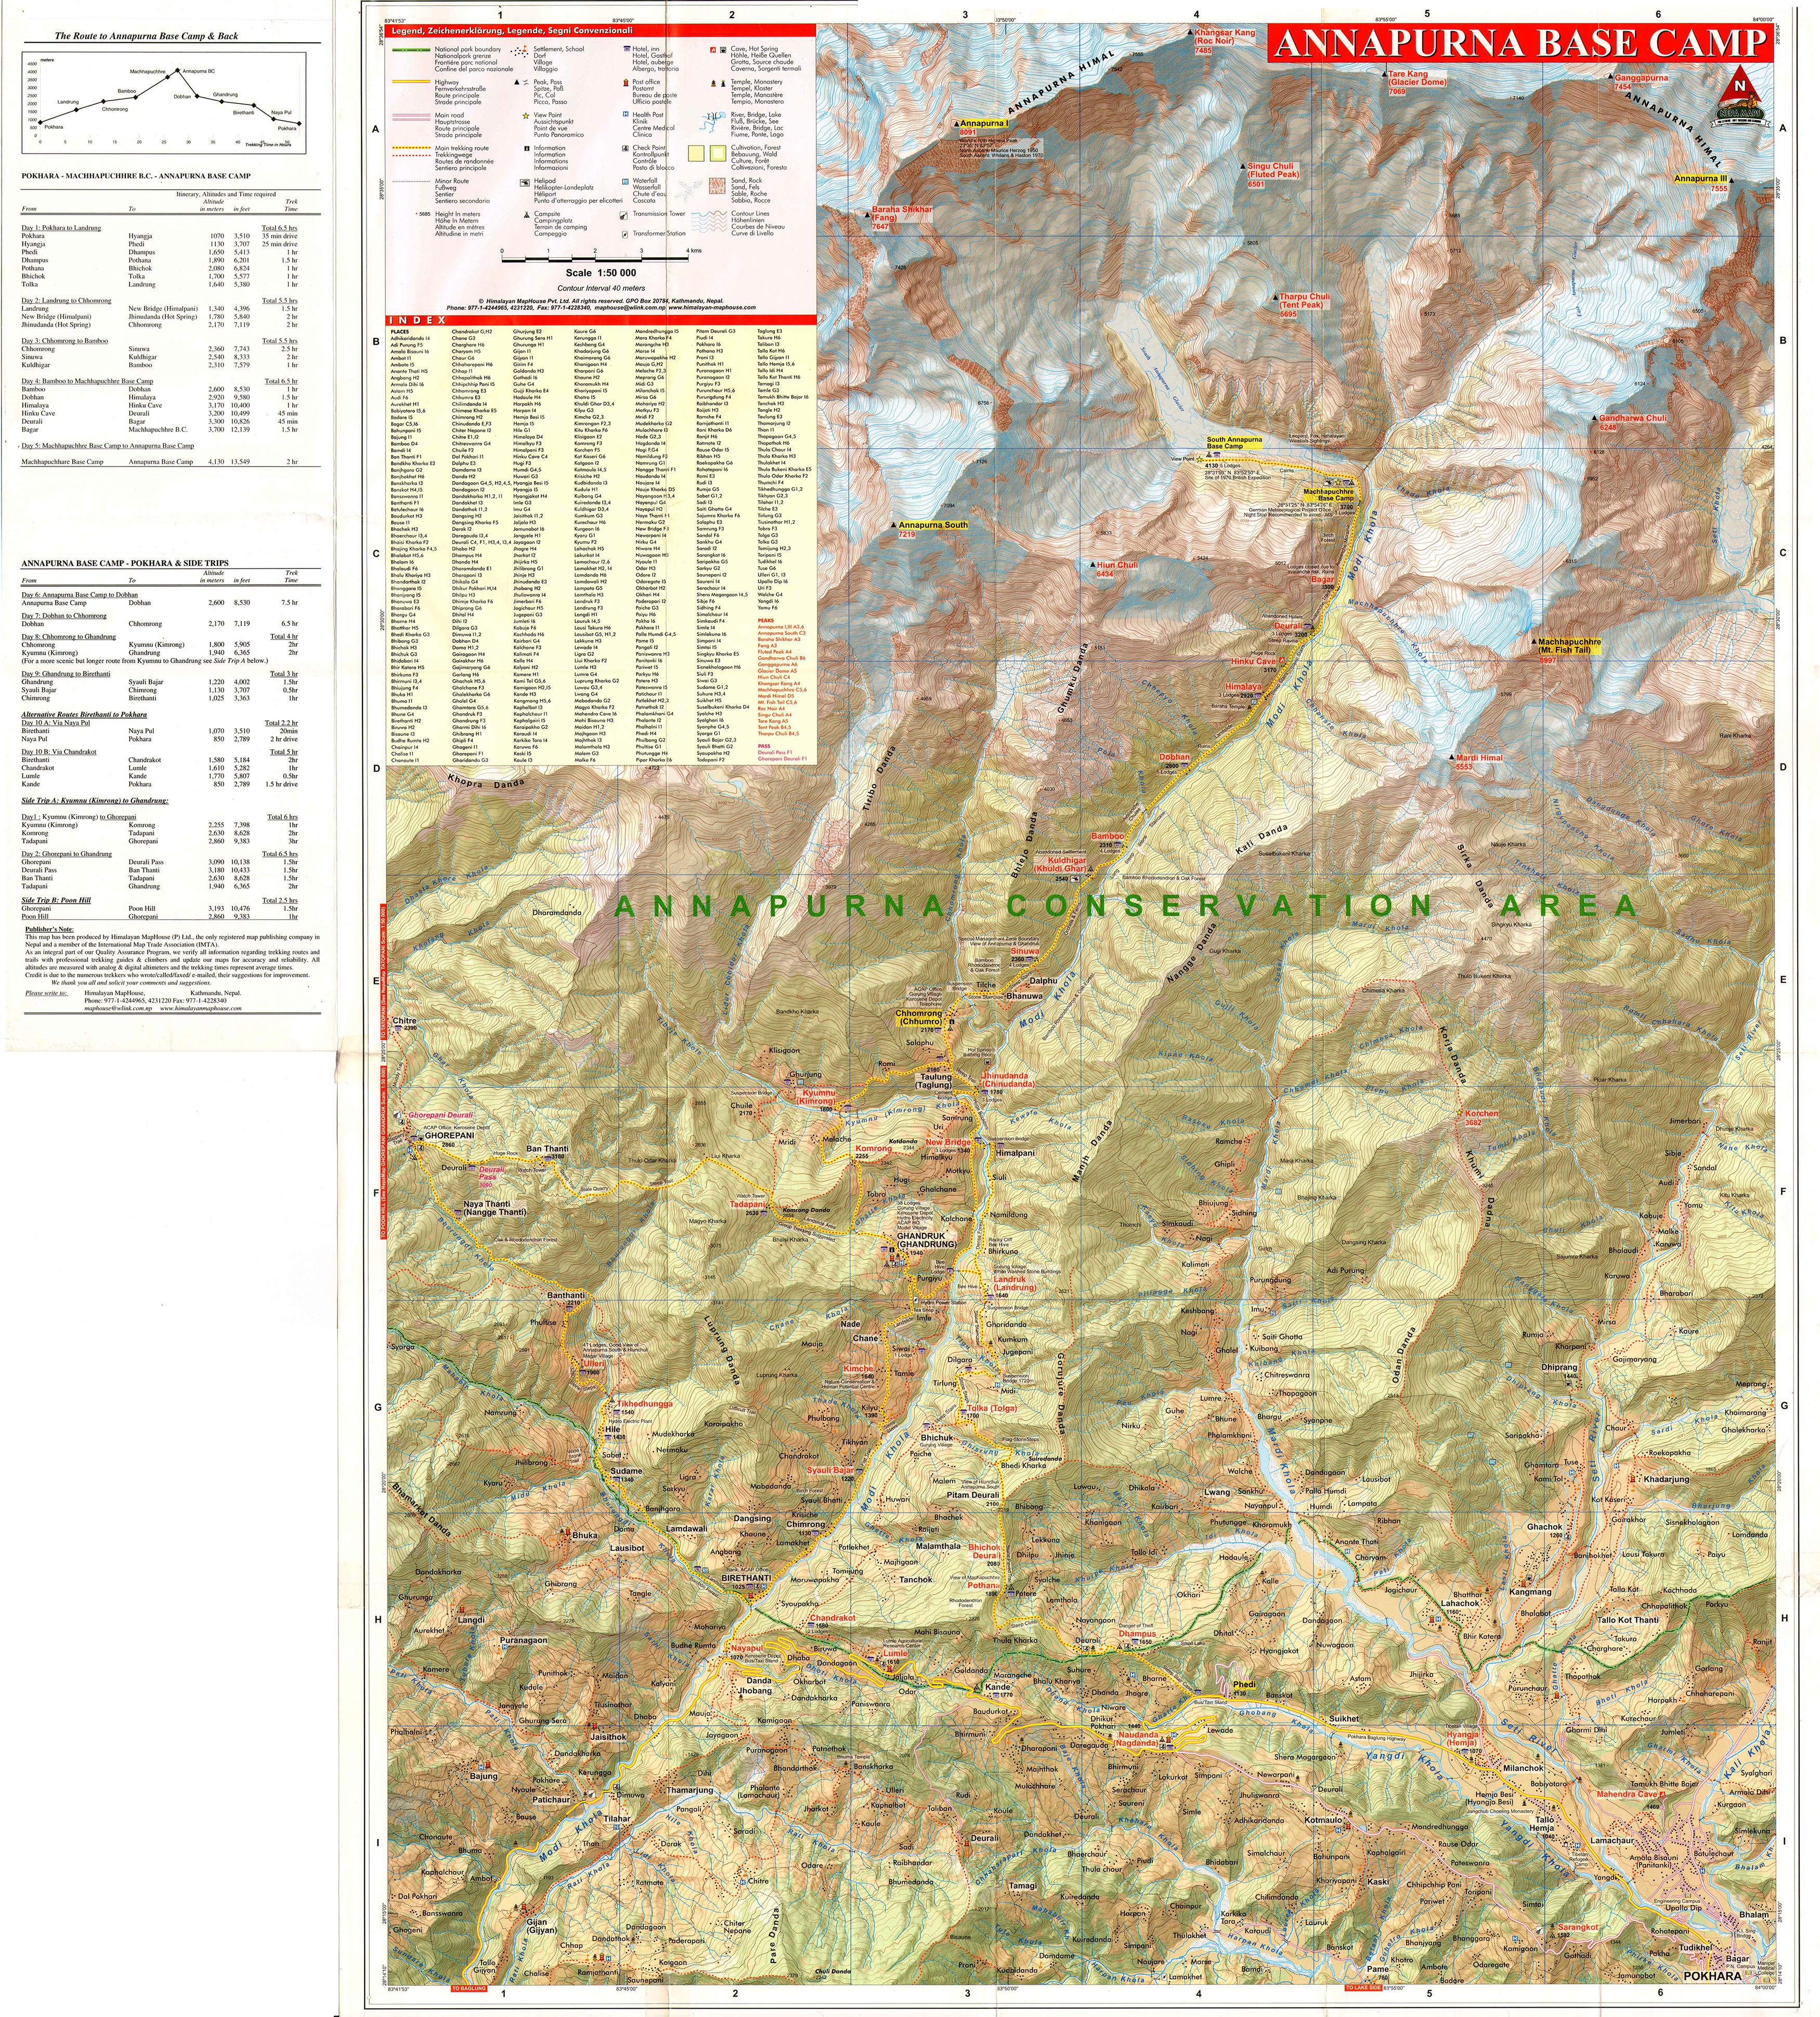 Горный массив Аннапурна и базовый лагерь, Непал, карта, масштаб 1:50000. Map - Annapurna Base Camp and Tent Peak, Nepal